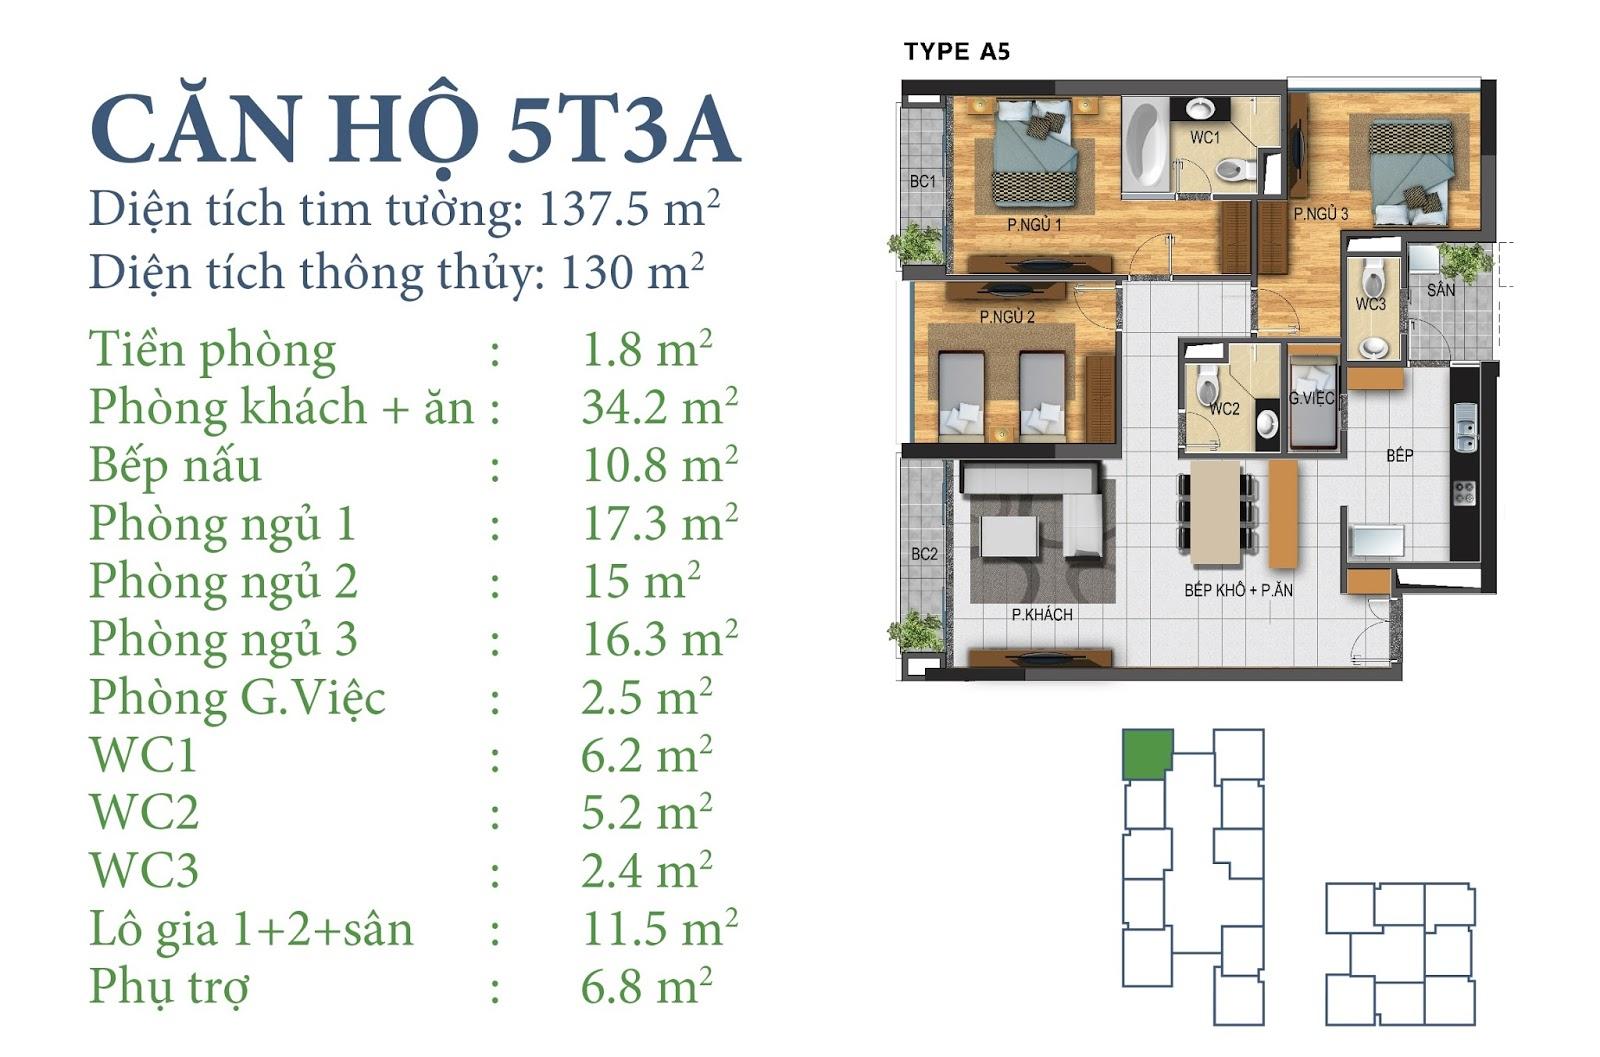 5T3A-horizon-tower-ngoai-giao-doan